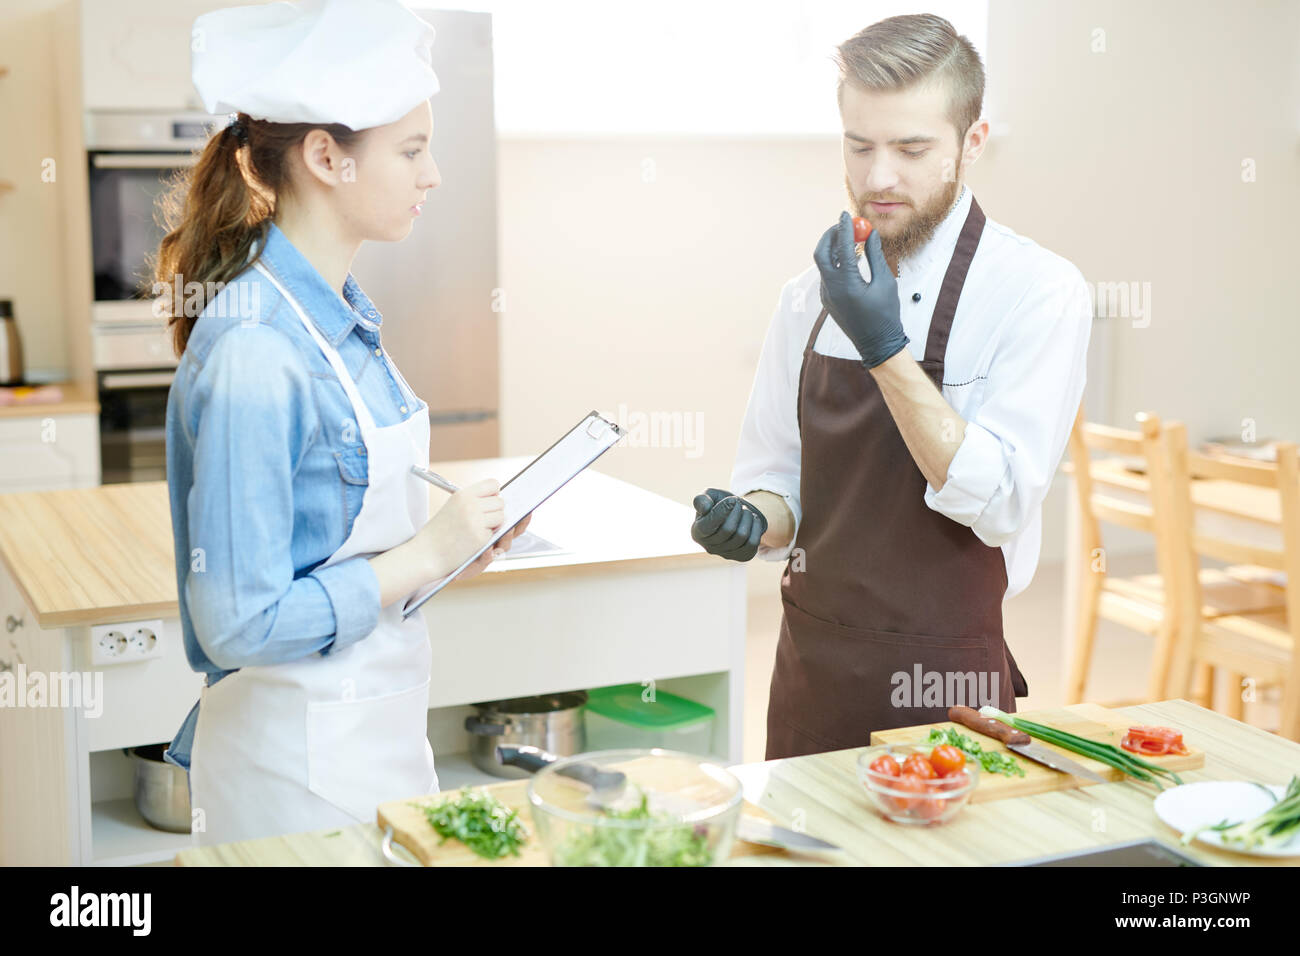 Two Chefs in Restaurant Kitchen - Stock Image